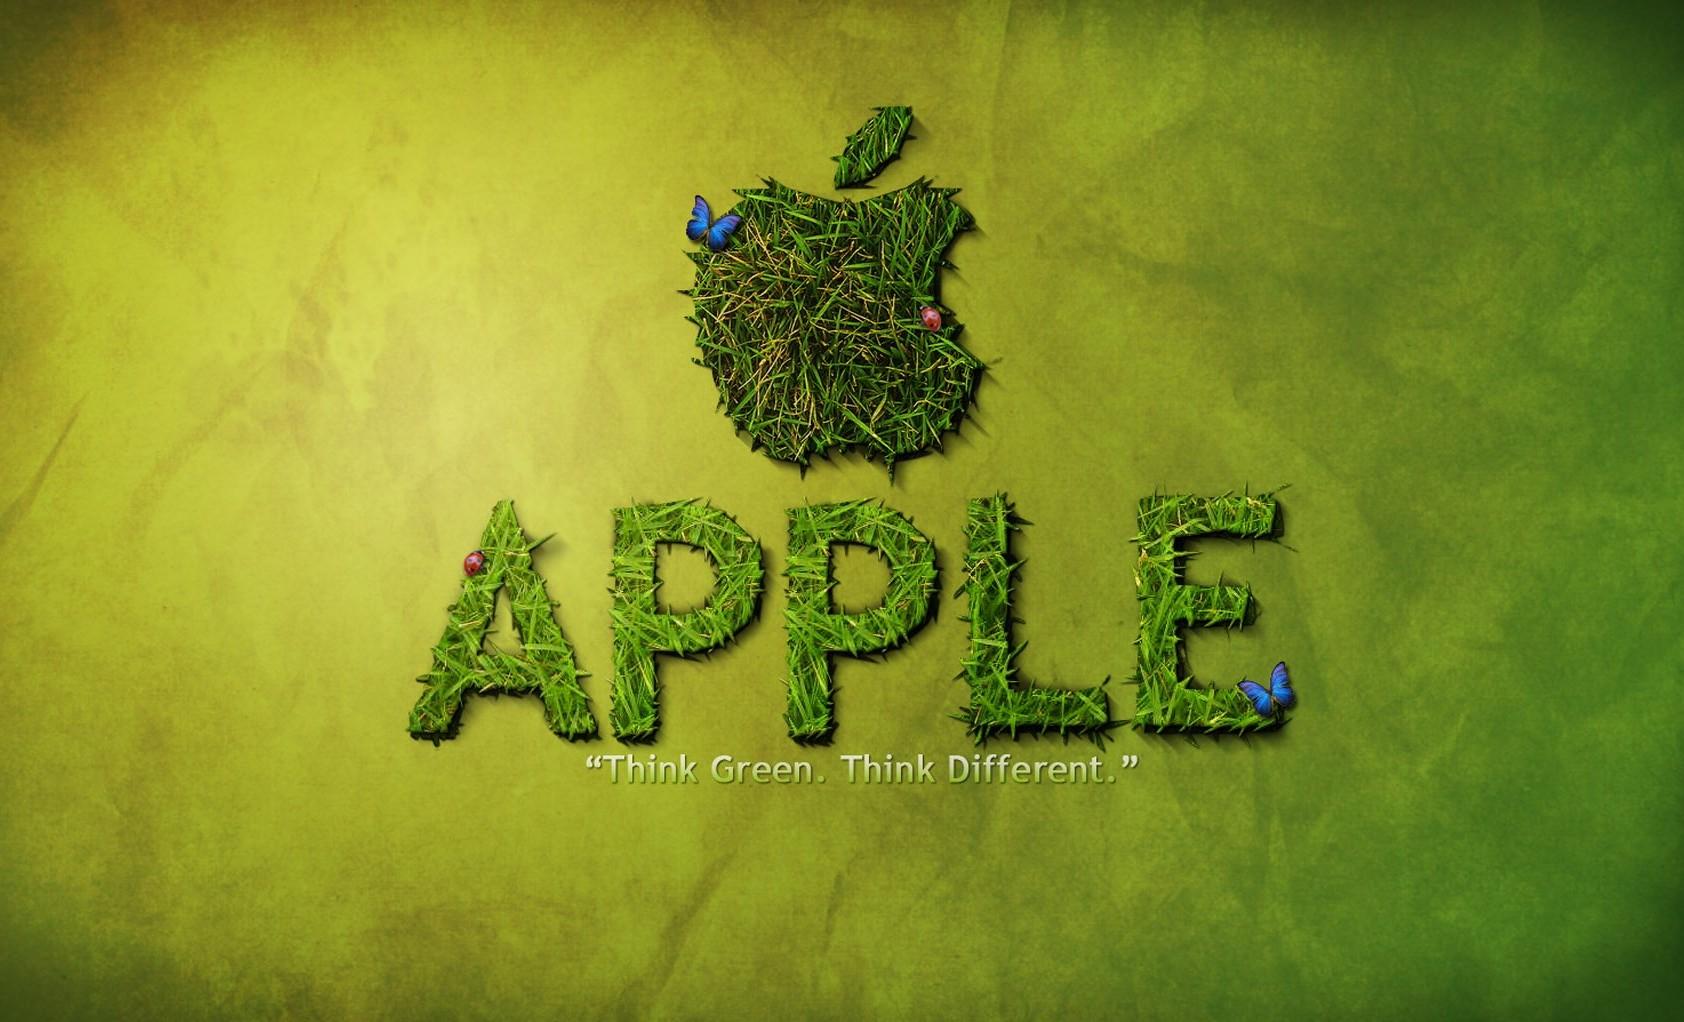 apple-logo-think-green-